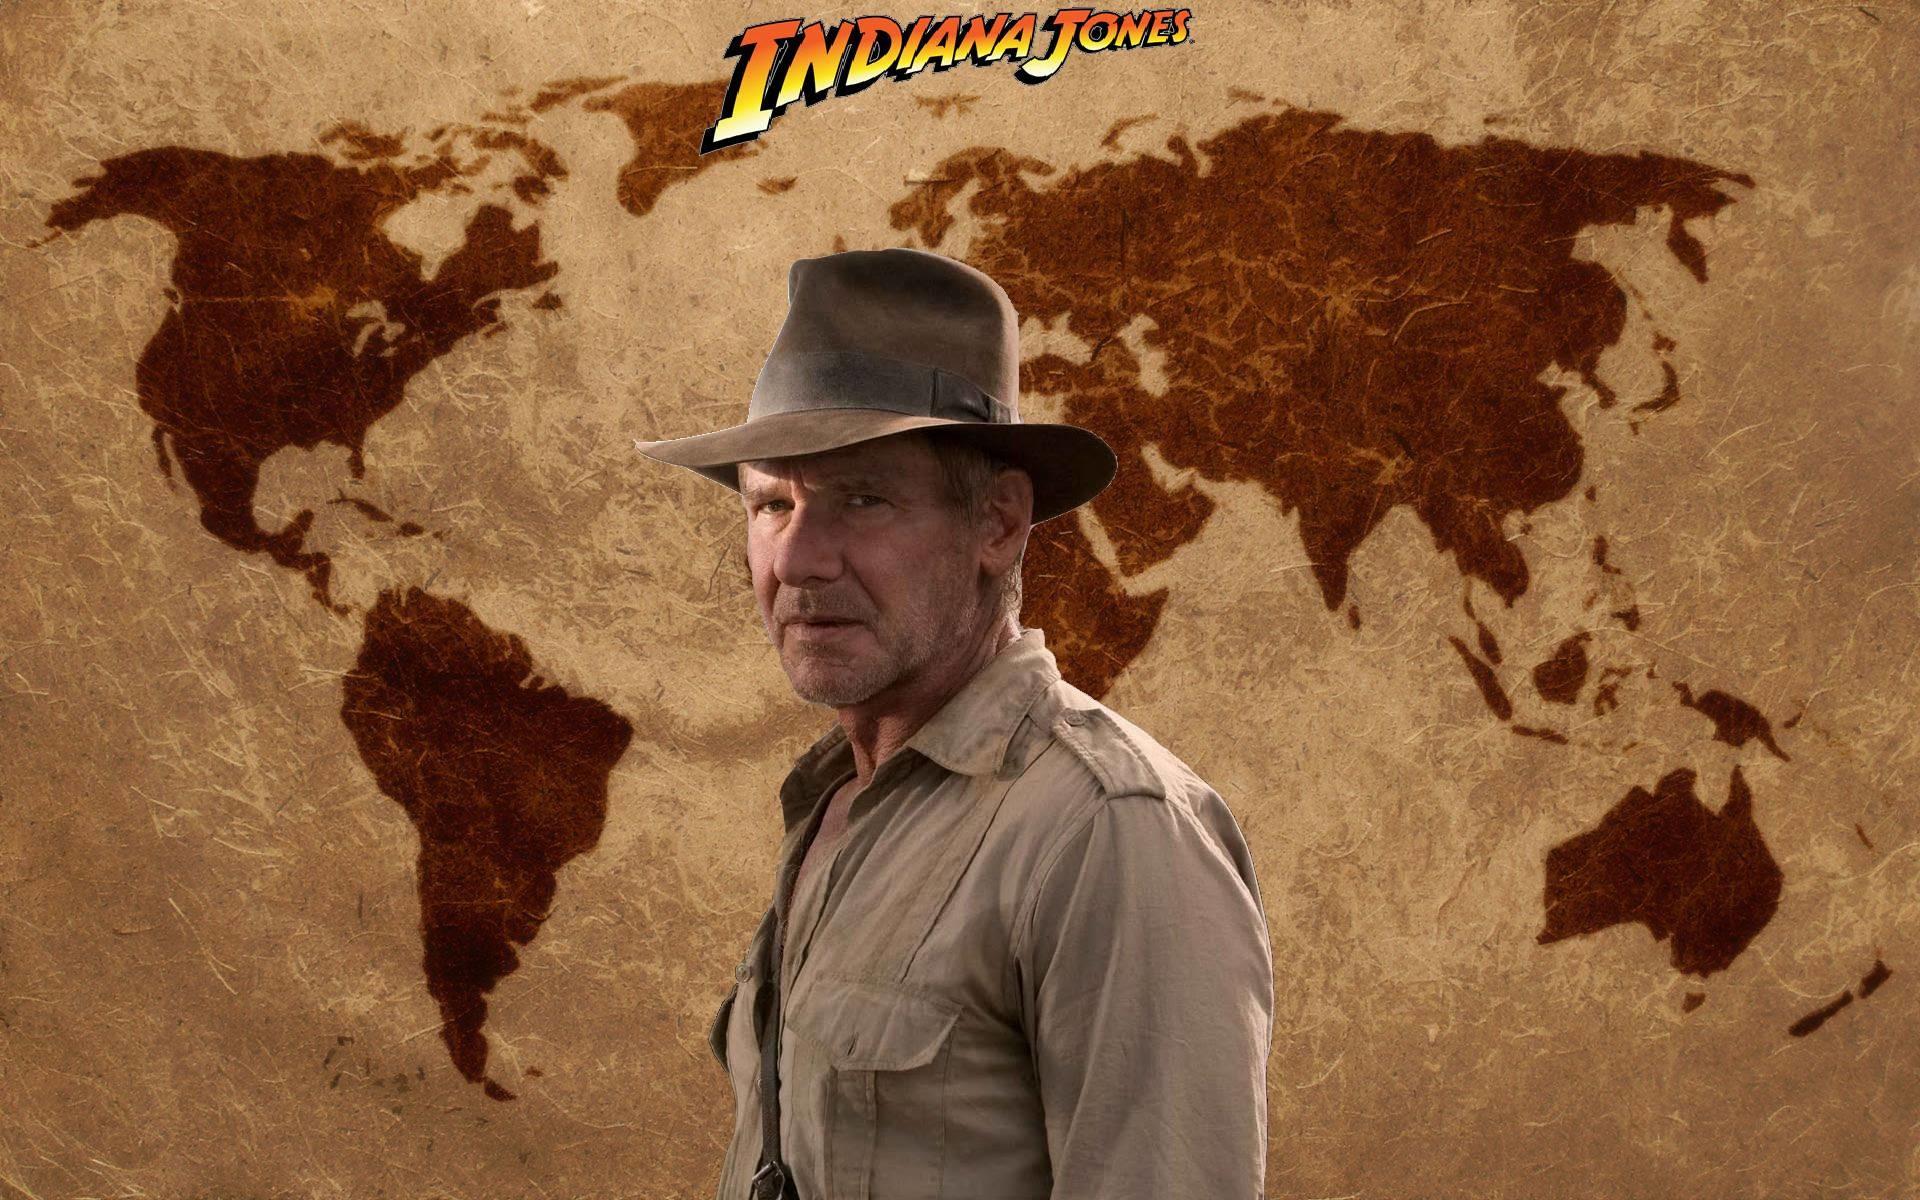 1920x1200 Indiana Jones Wallpapers Wallpaper Cave 7 Download High Resolution